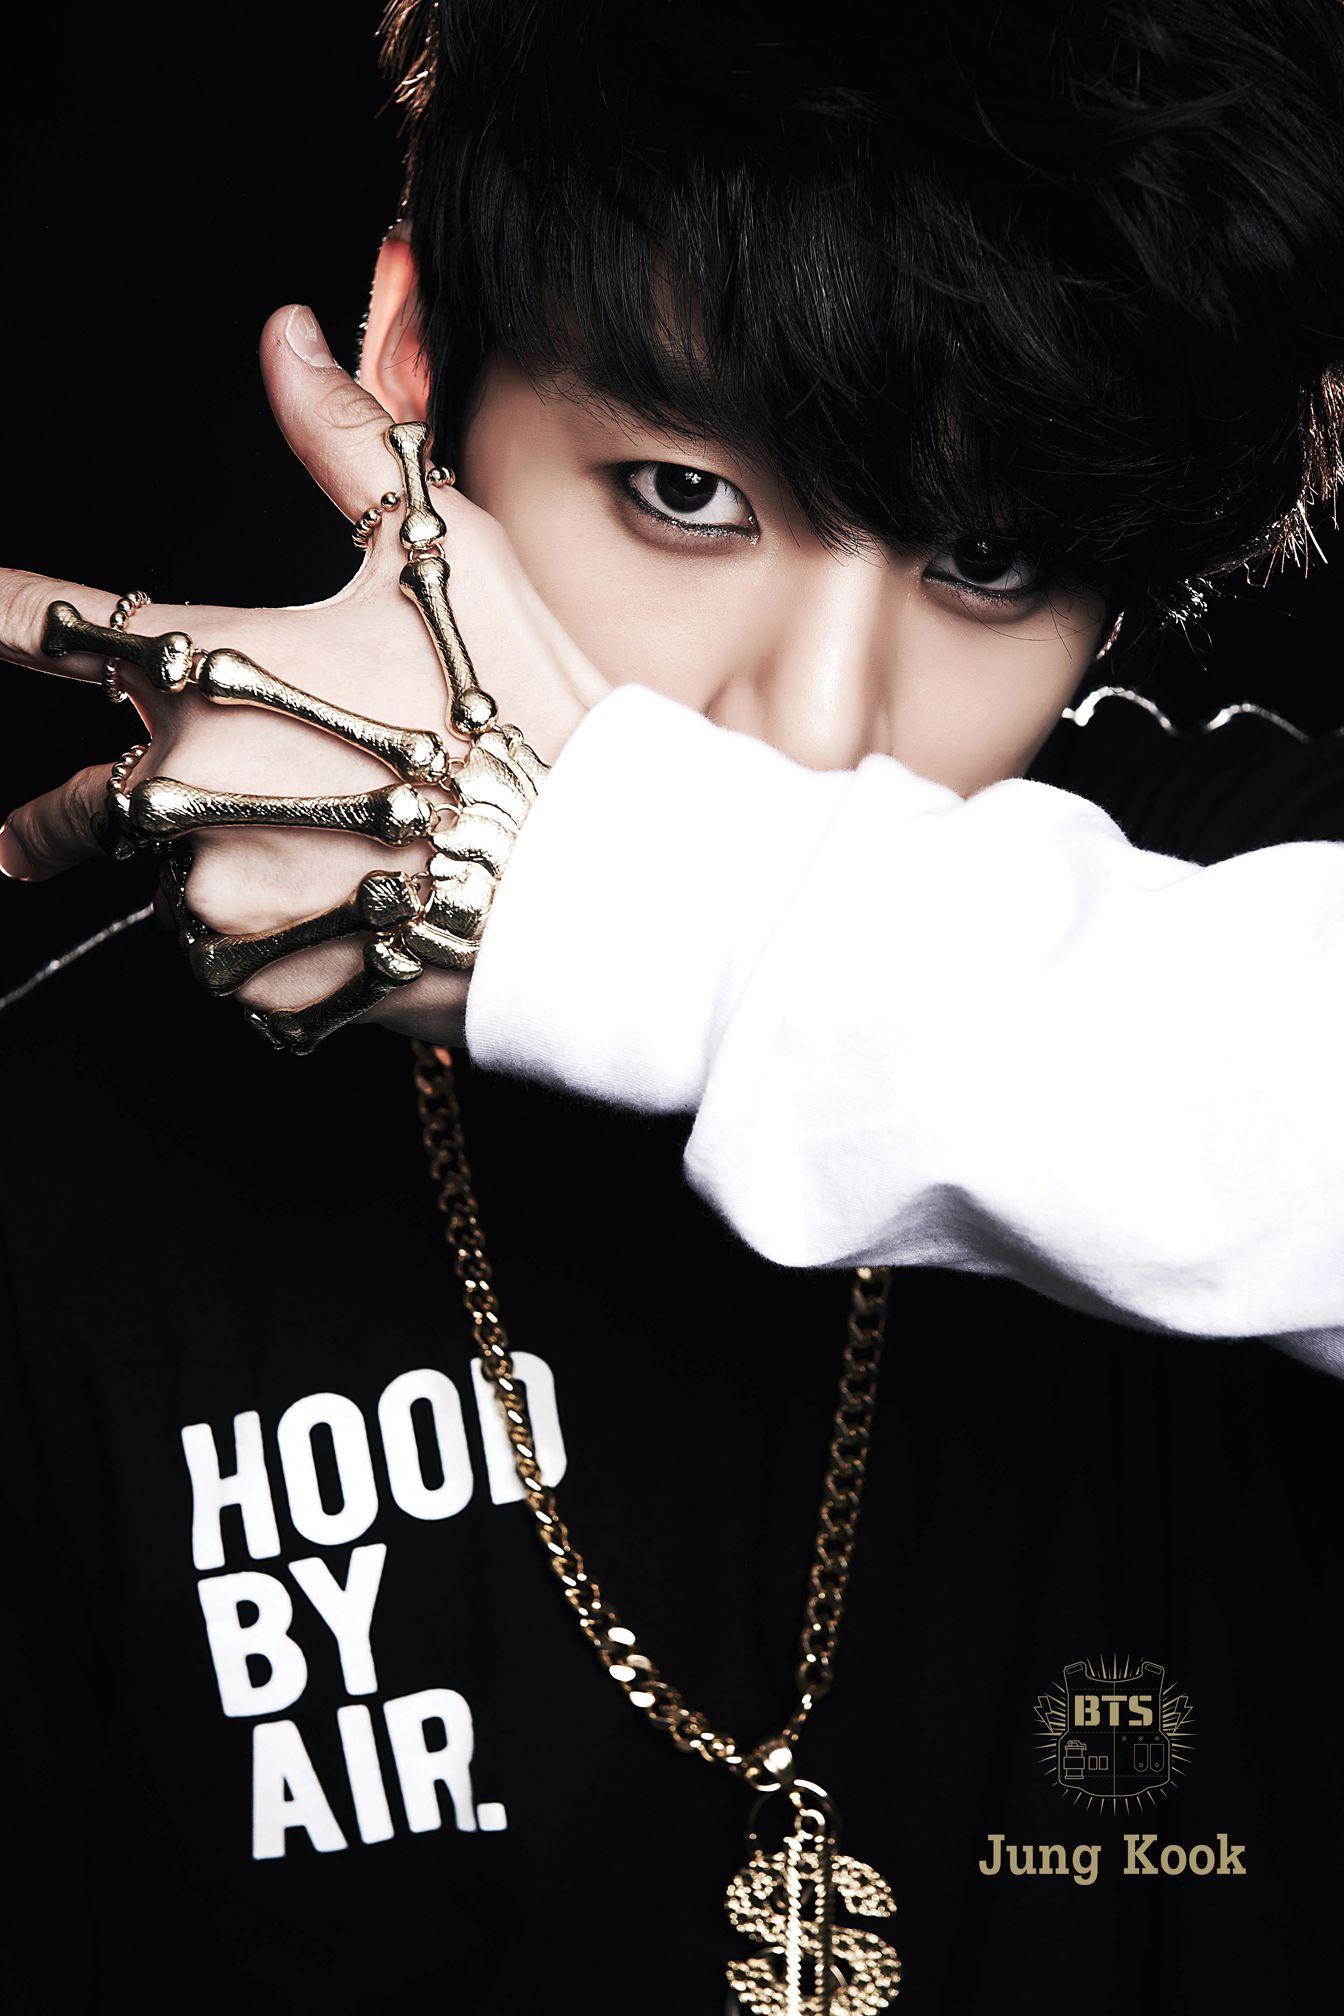 BTS Jung Kook Profile